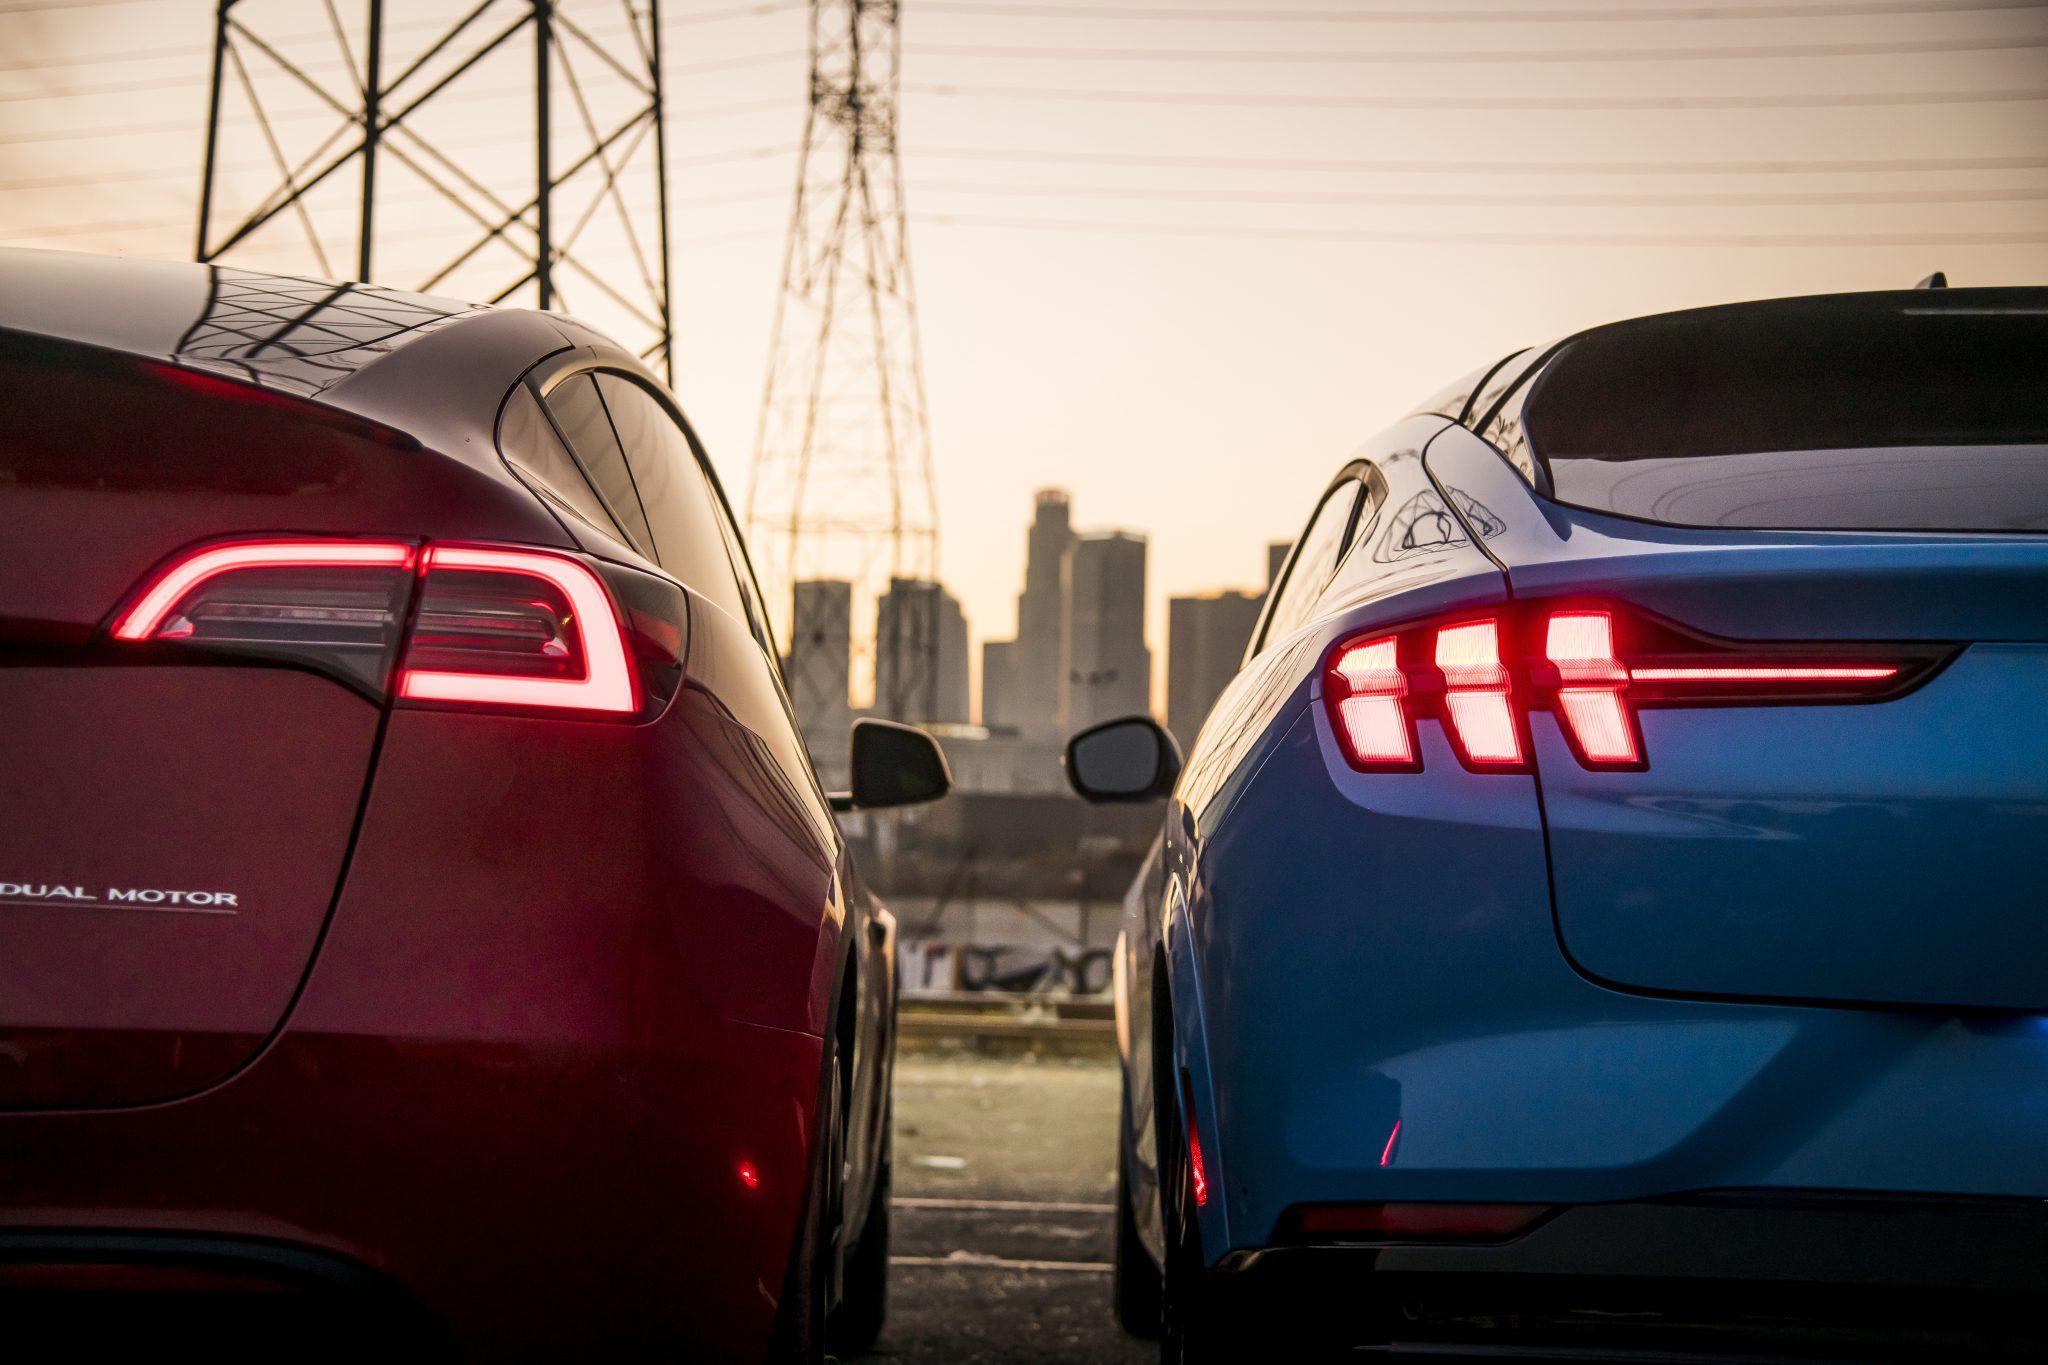 Ford Mustang Mach-E vs Tesla Model Y